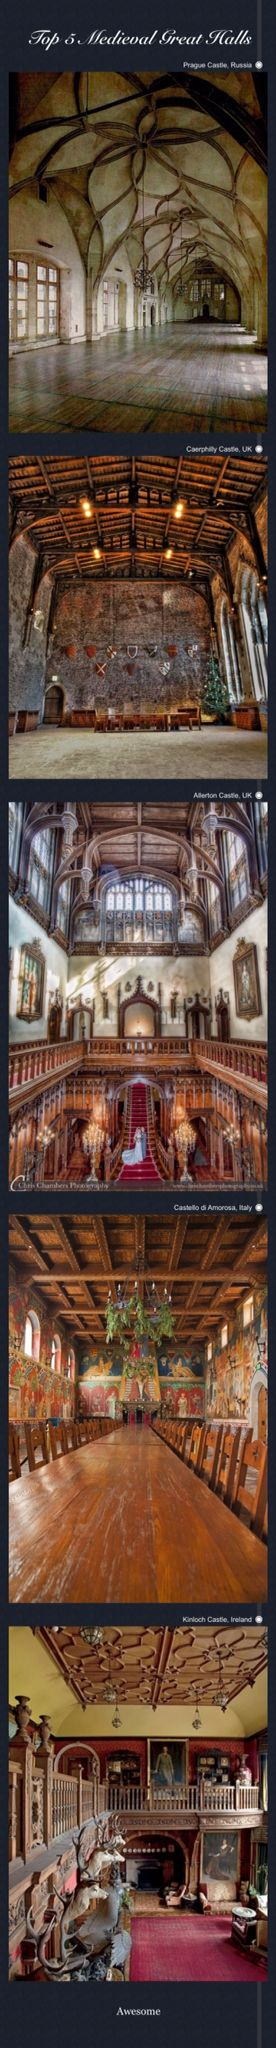 Top 5 Great Halls